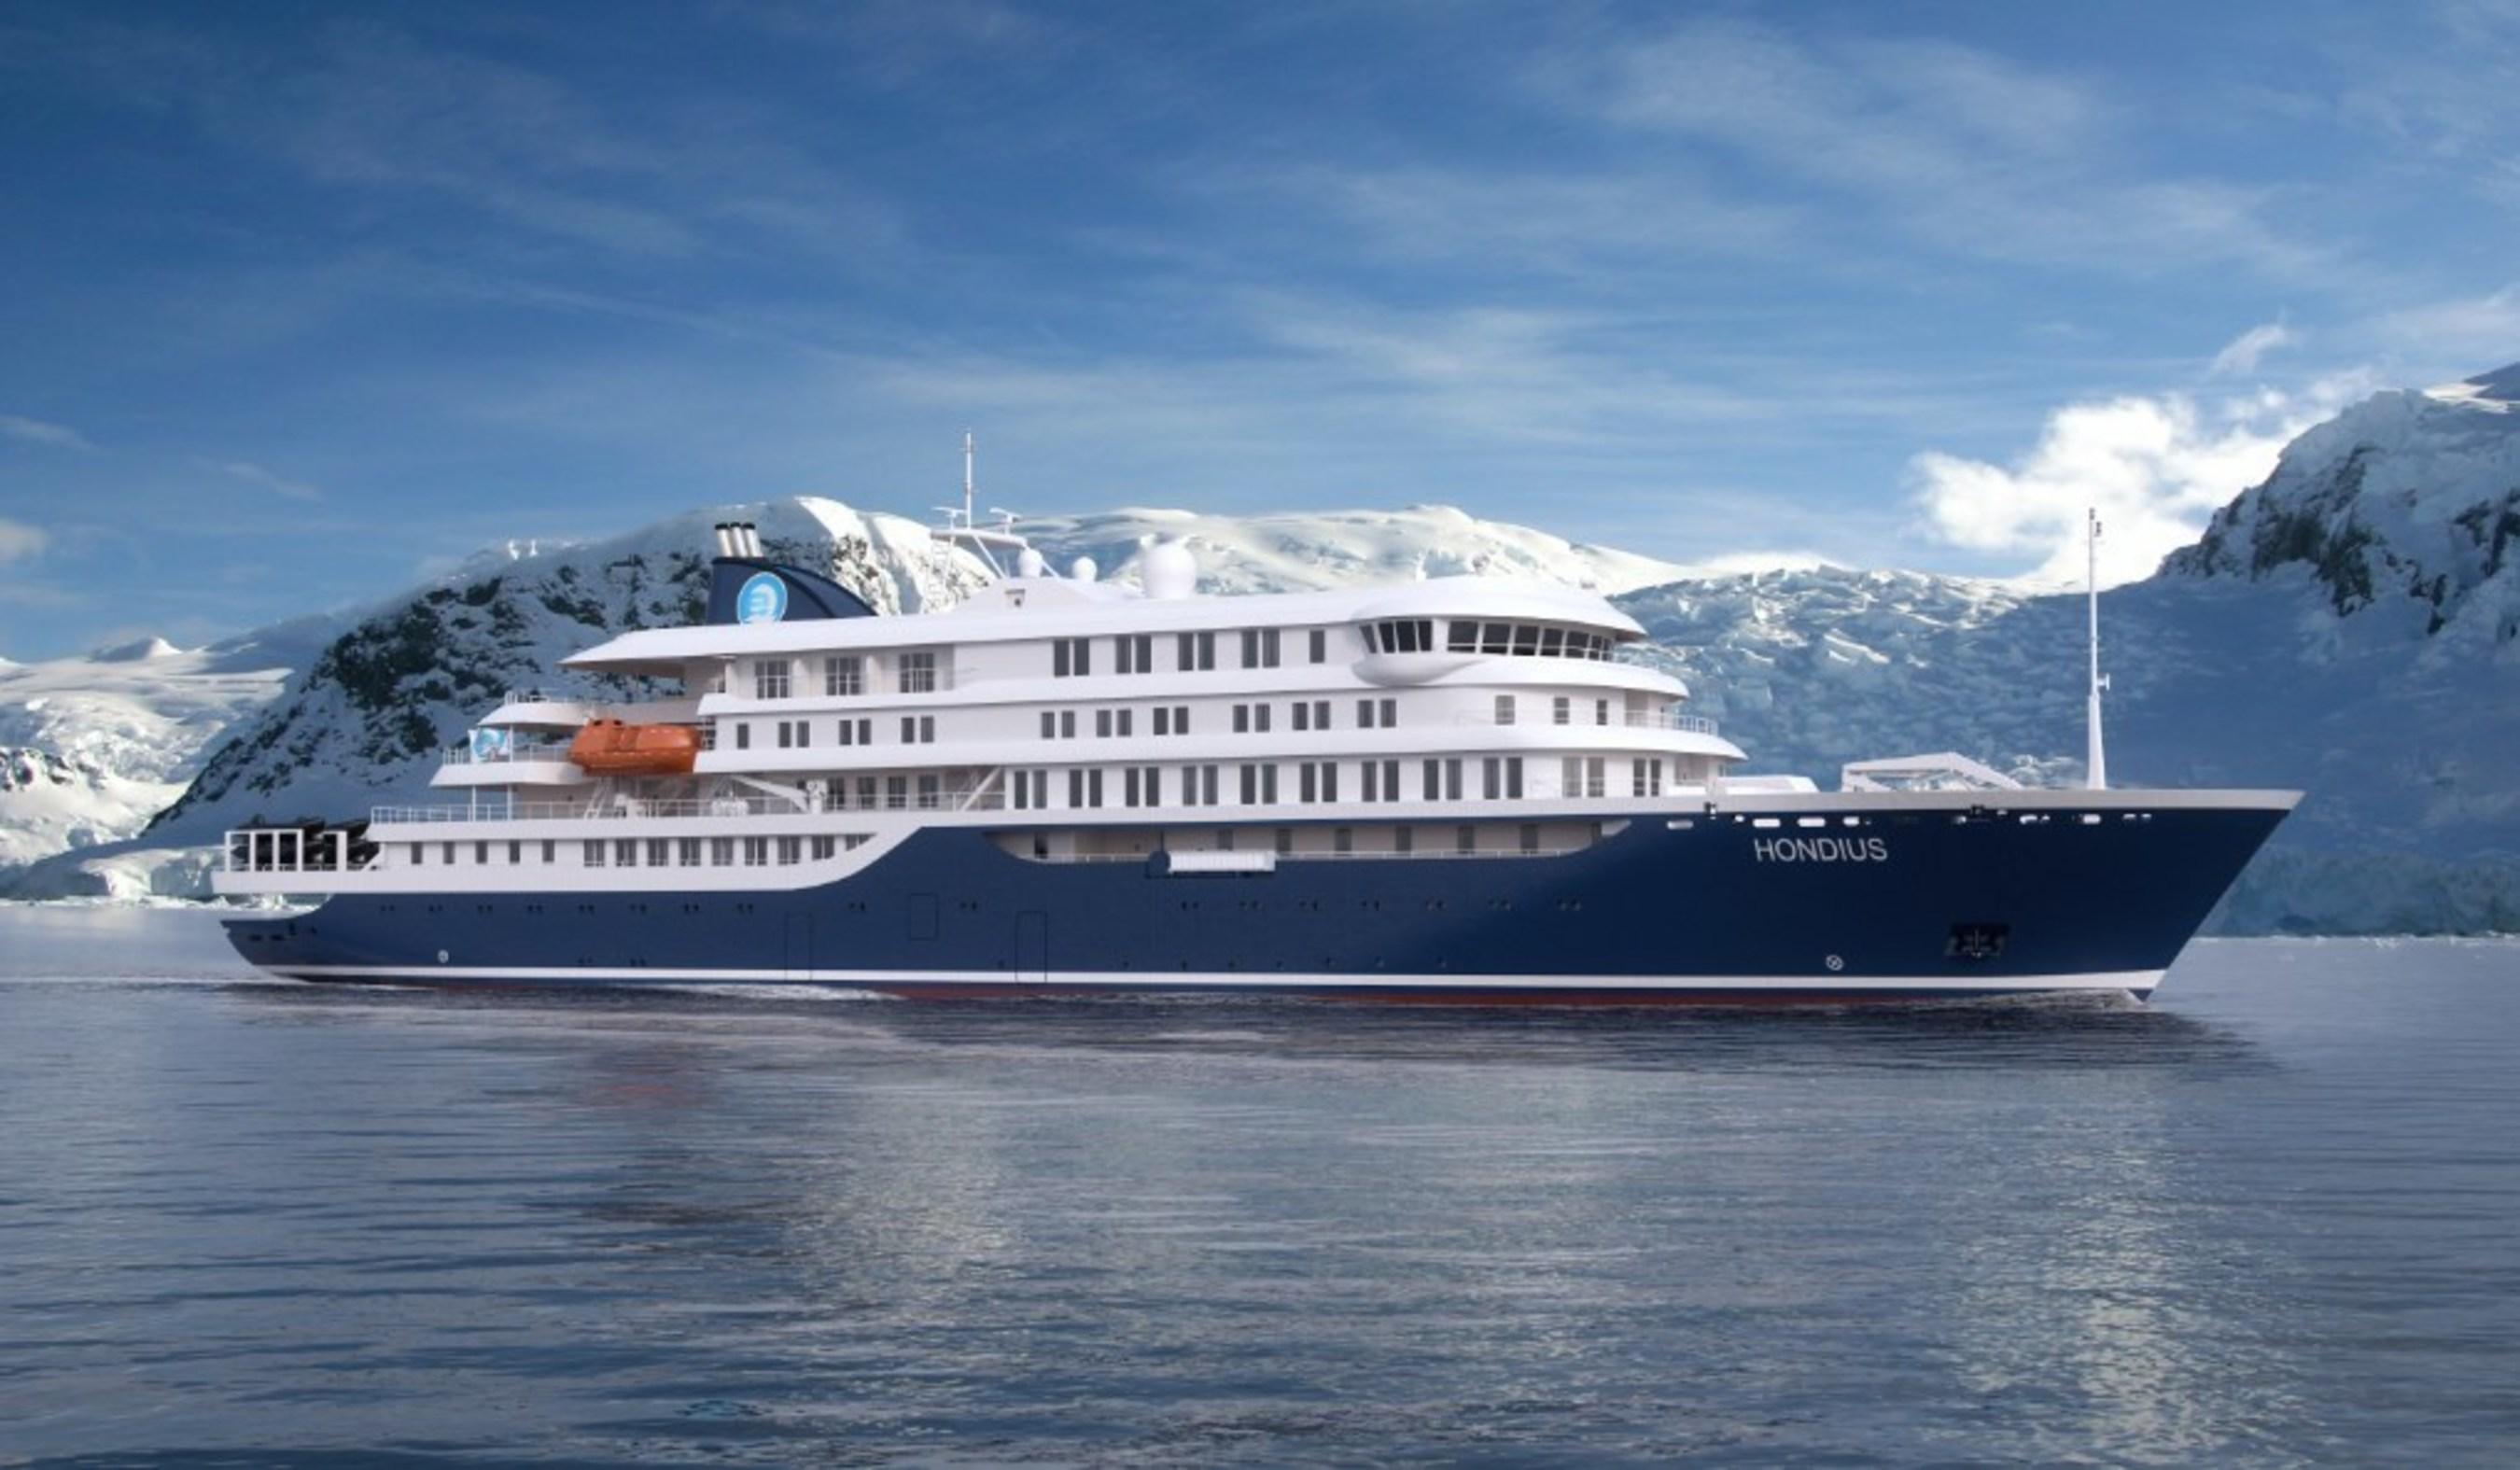 Oceanwide's new advanced Polar vessel Hondius